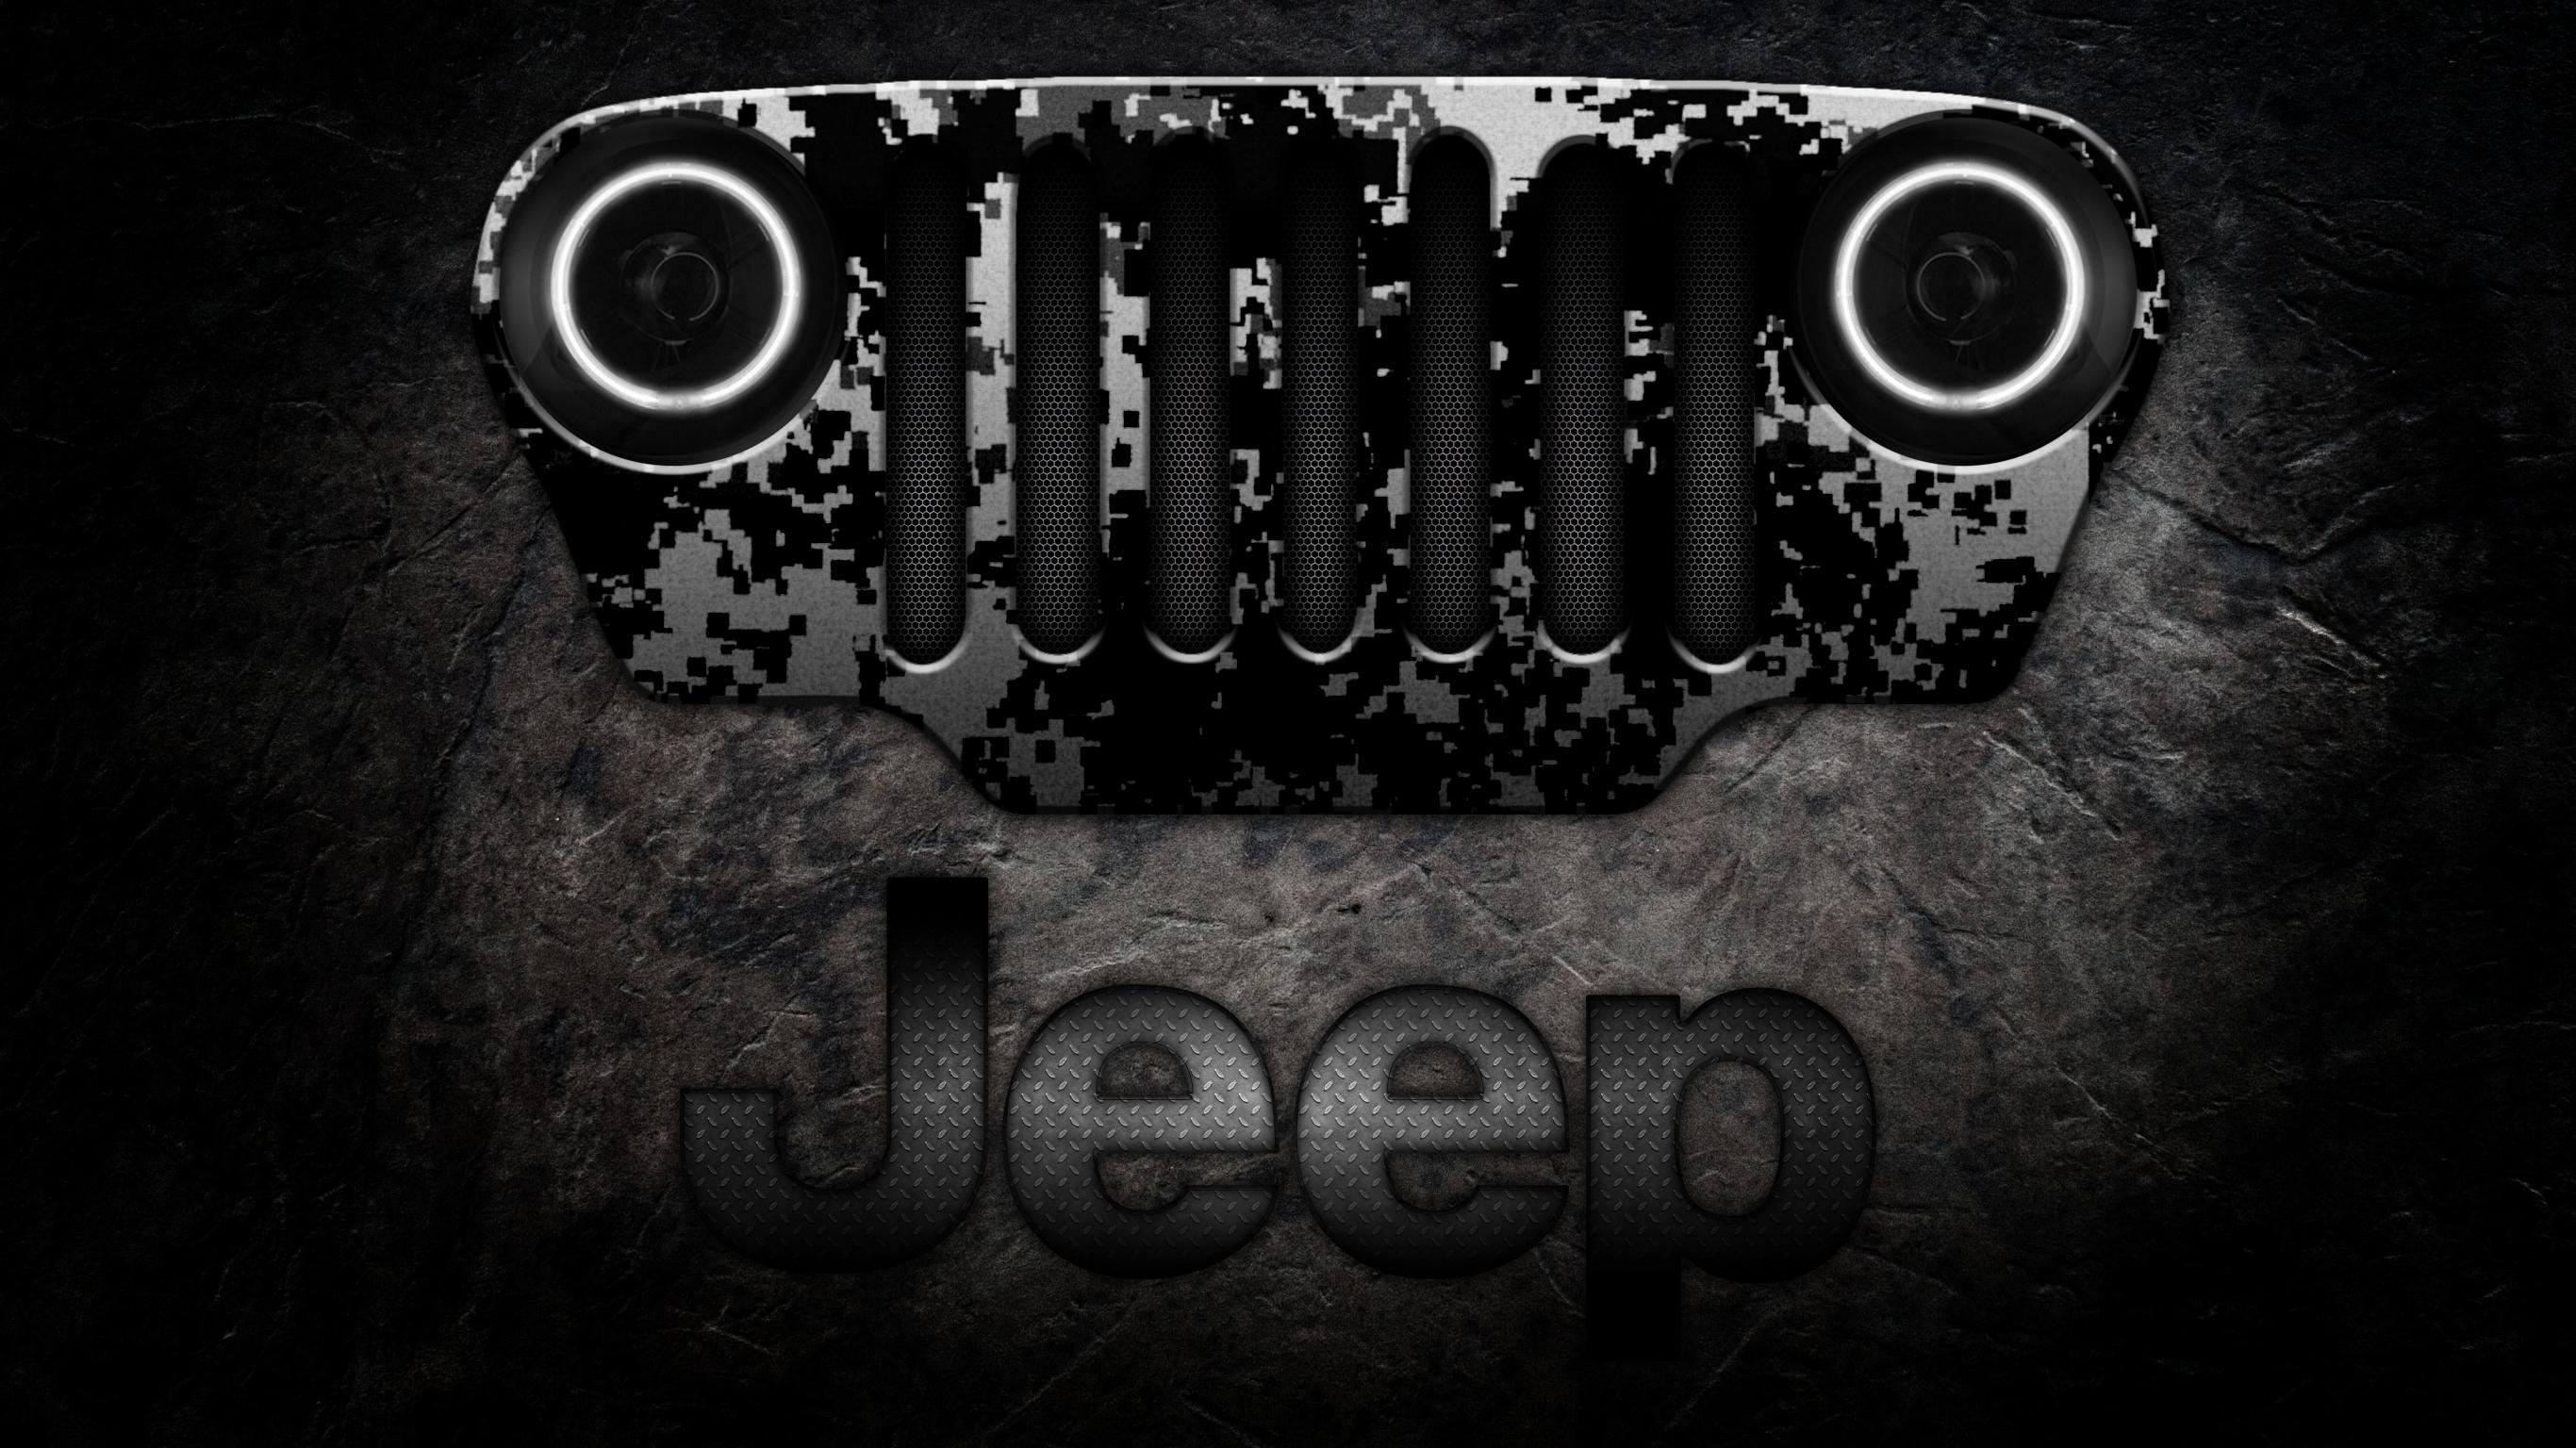 44 Jeep Iphone Wallpaper On Wallpapersafari